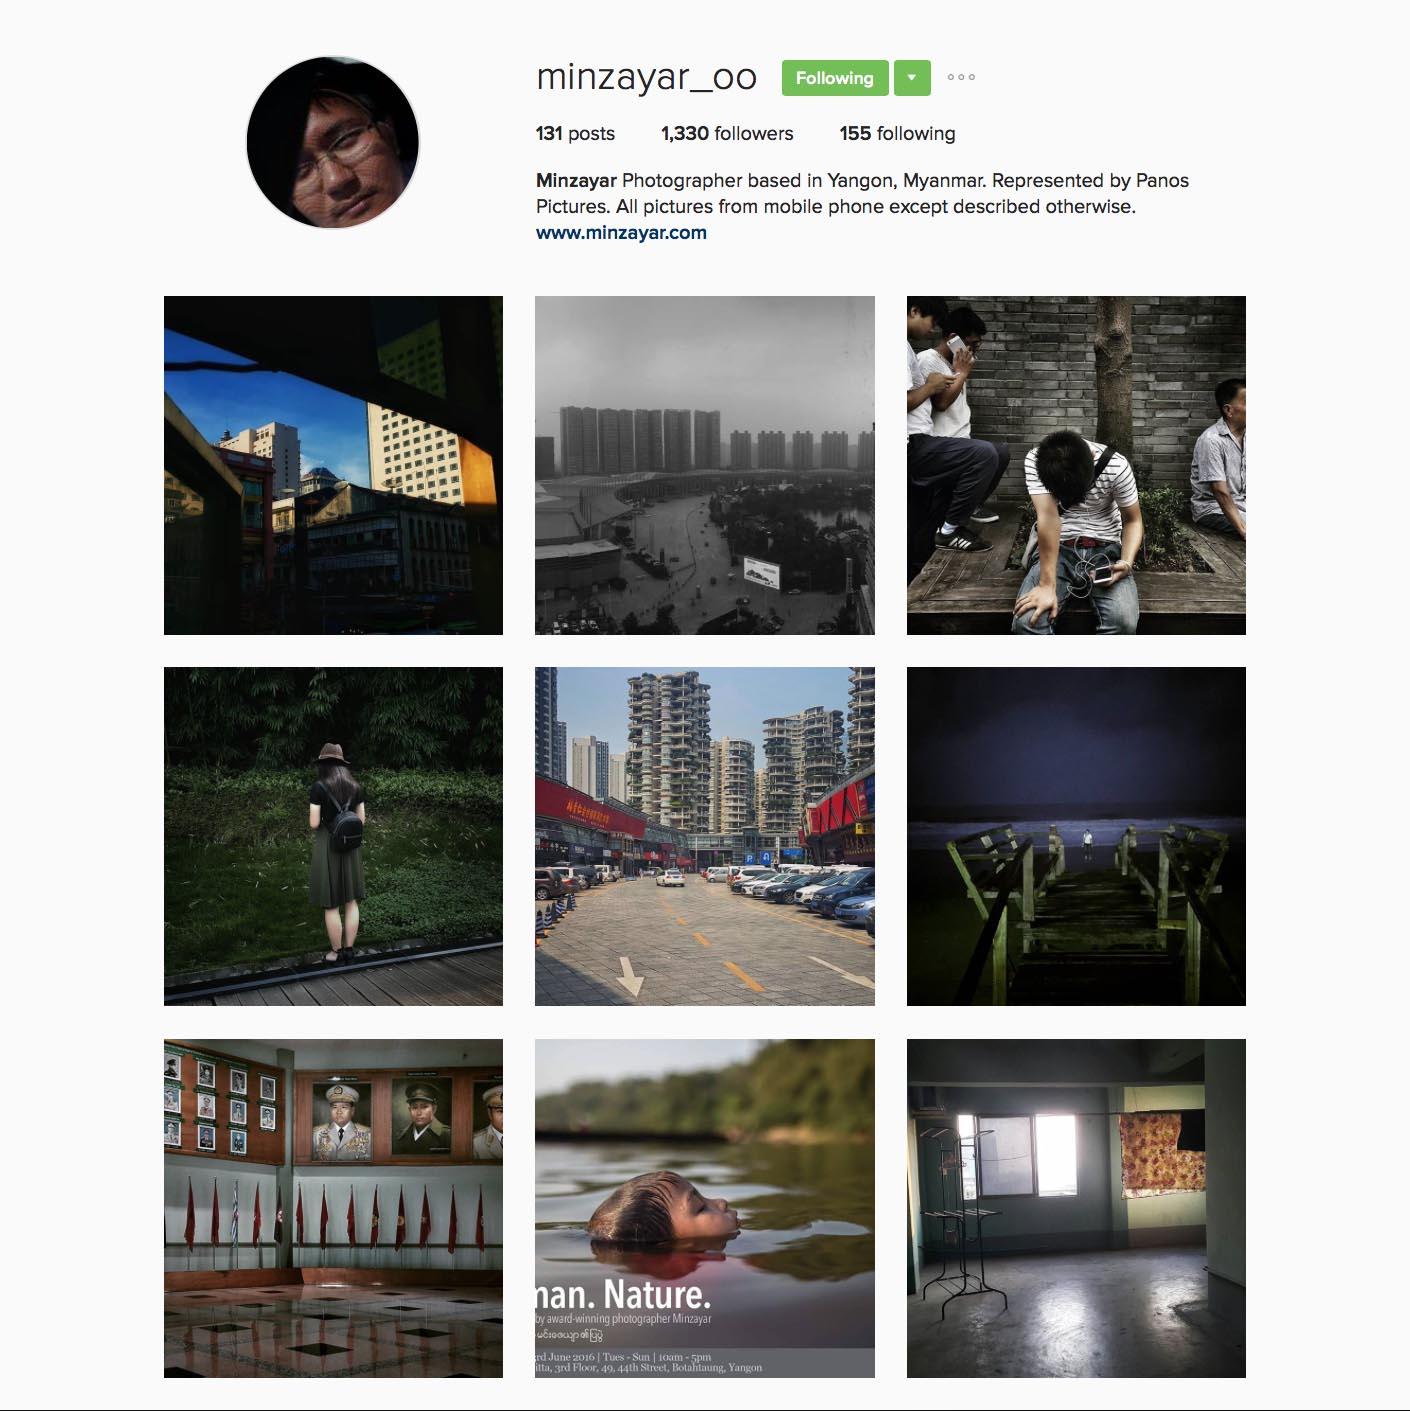 MinZayar Oo(@minzayar_oo),Panos駐緬甸攝影師。曾在仰光攝影節、第九屆中國國際新聞攝影比賽、日本Days Japan國際新聞攝影獎等國際大賽中獲獎。